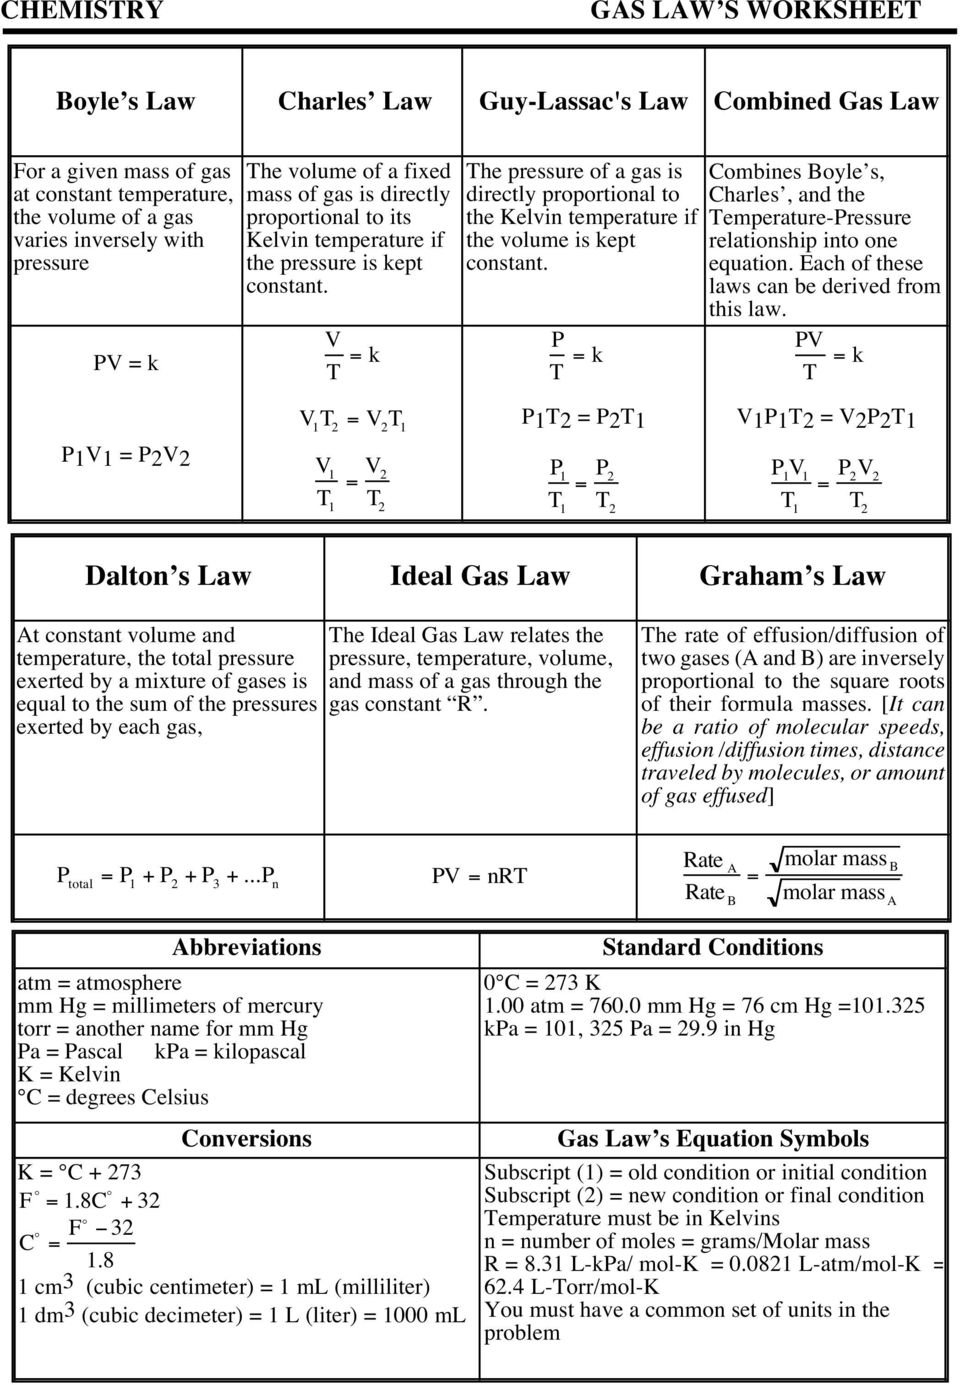 Chemistry Gas Law S Worksheet  Pdf Regarding Chemistry Gas Laws Worksheet Answers